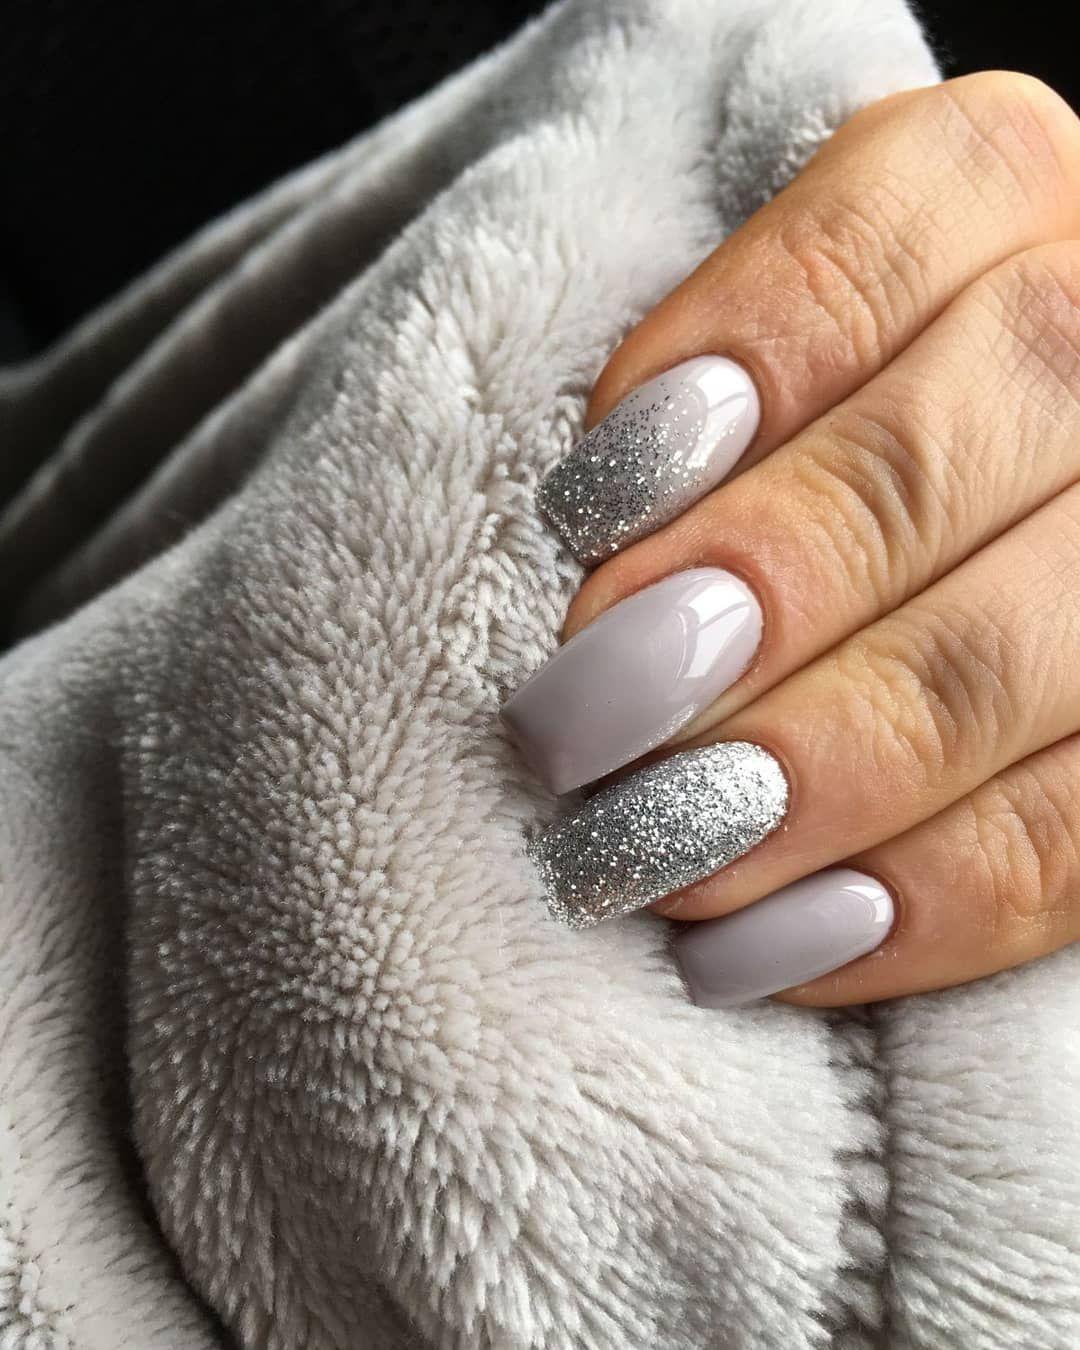 Gorgeous grey and glitter nail art design #greynail #glitternail